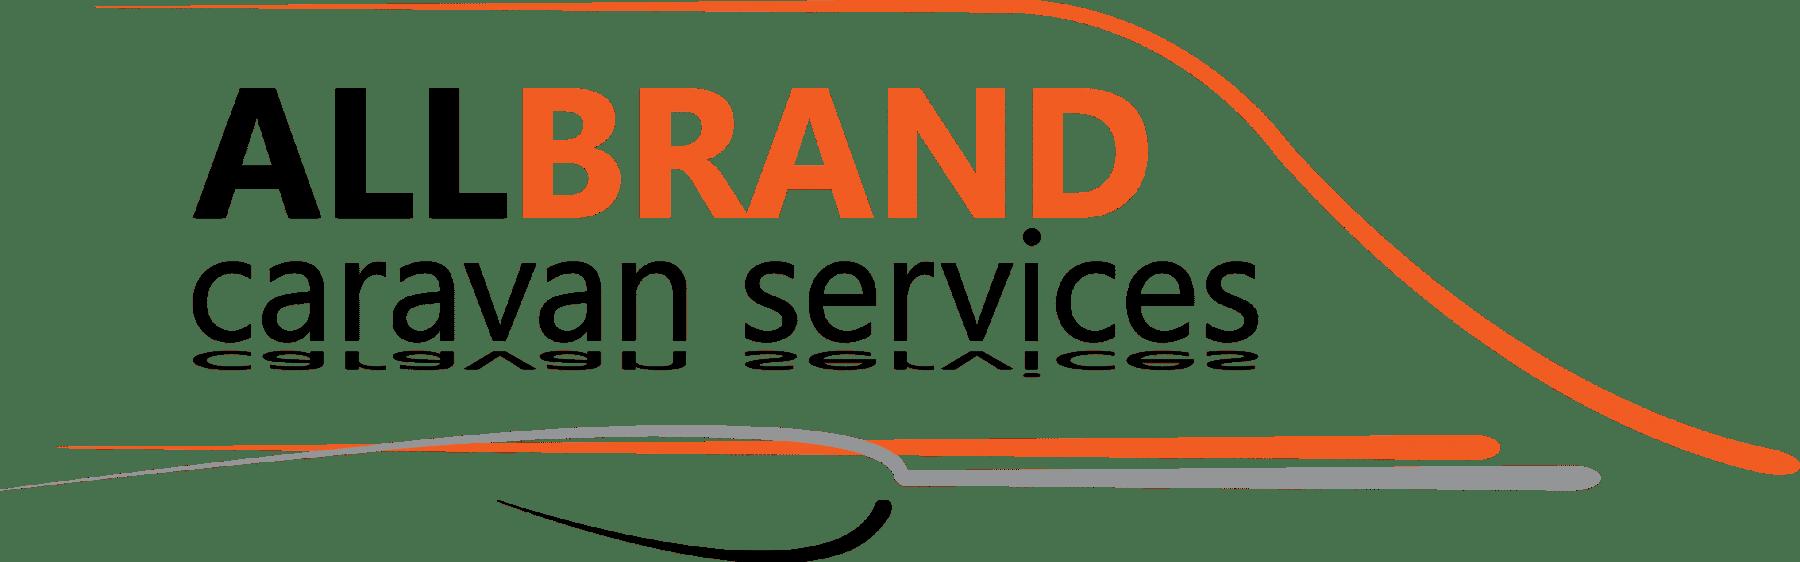 AllBrand Caravans logo